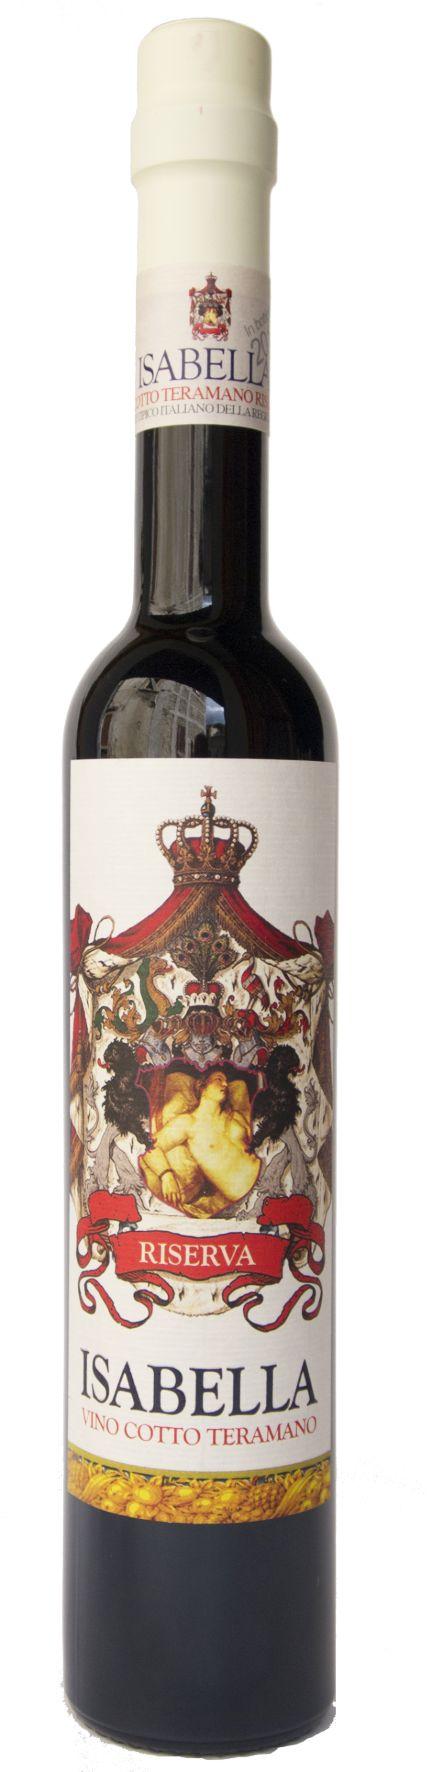 vino-cotto-isabella